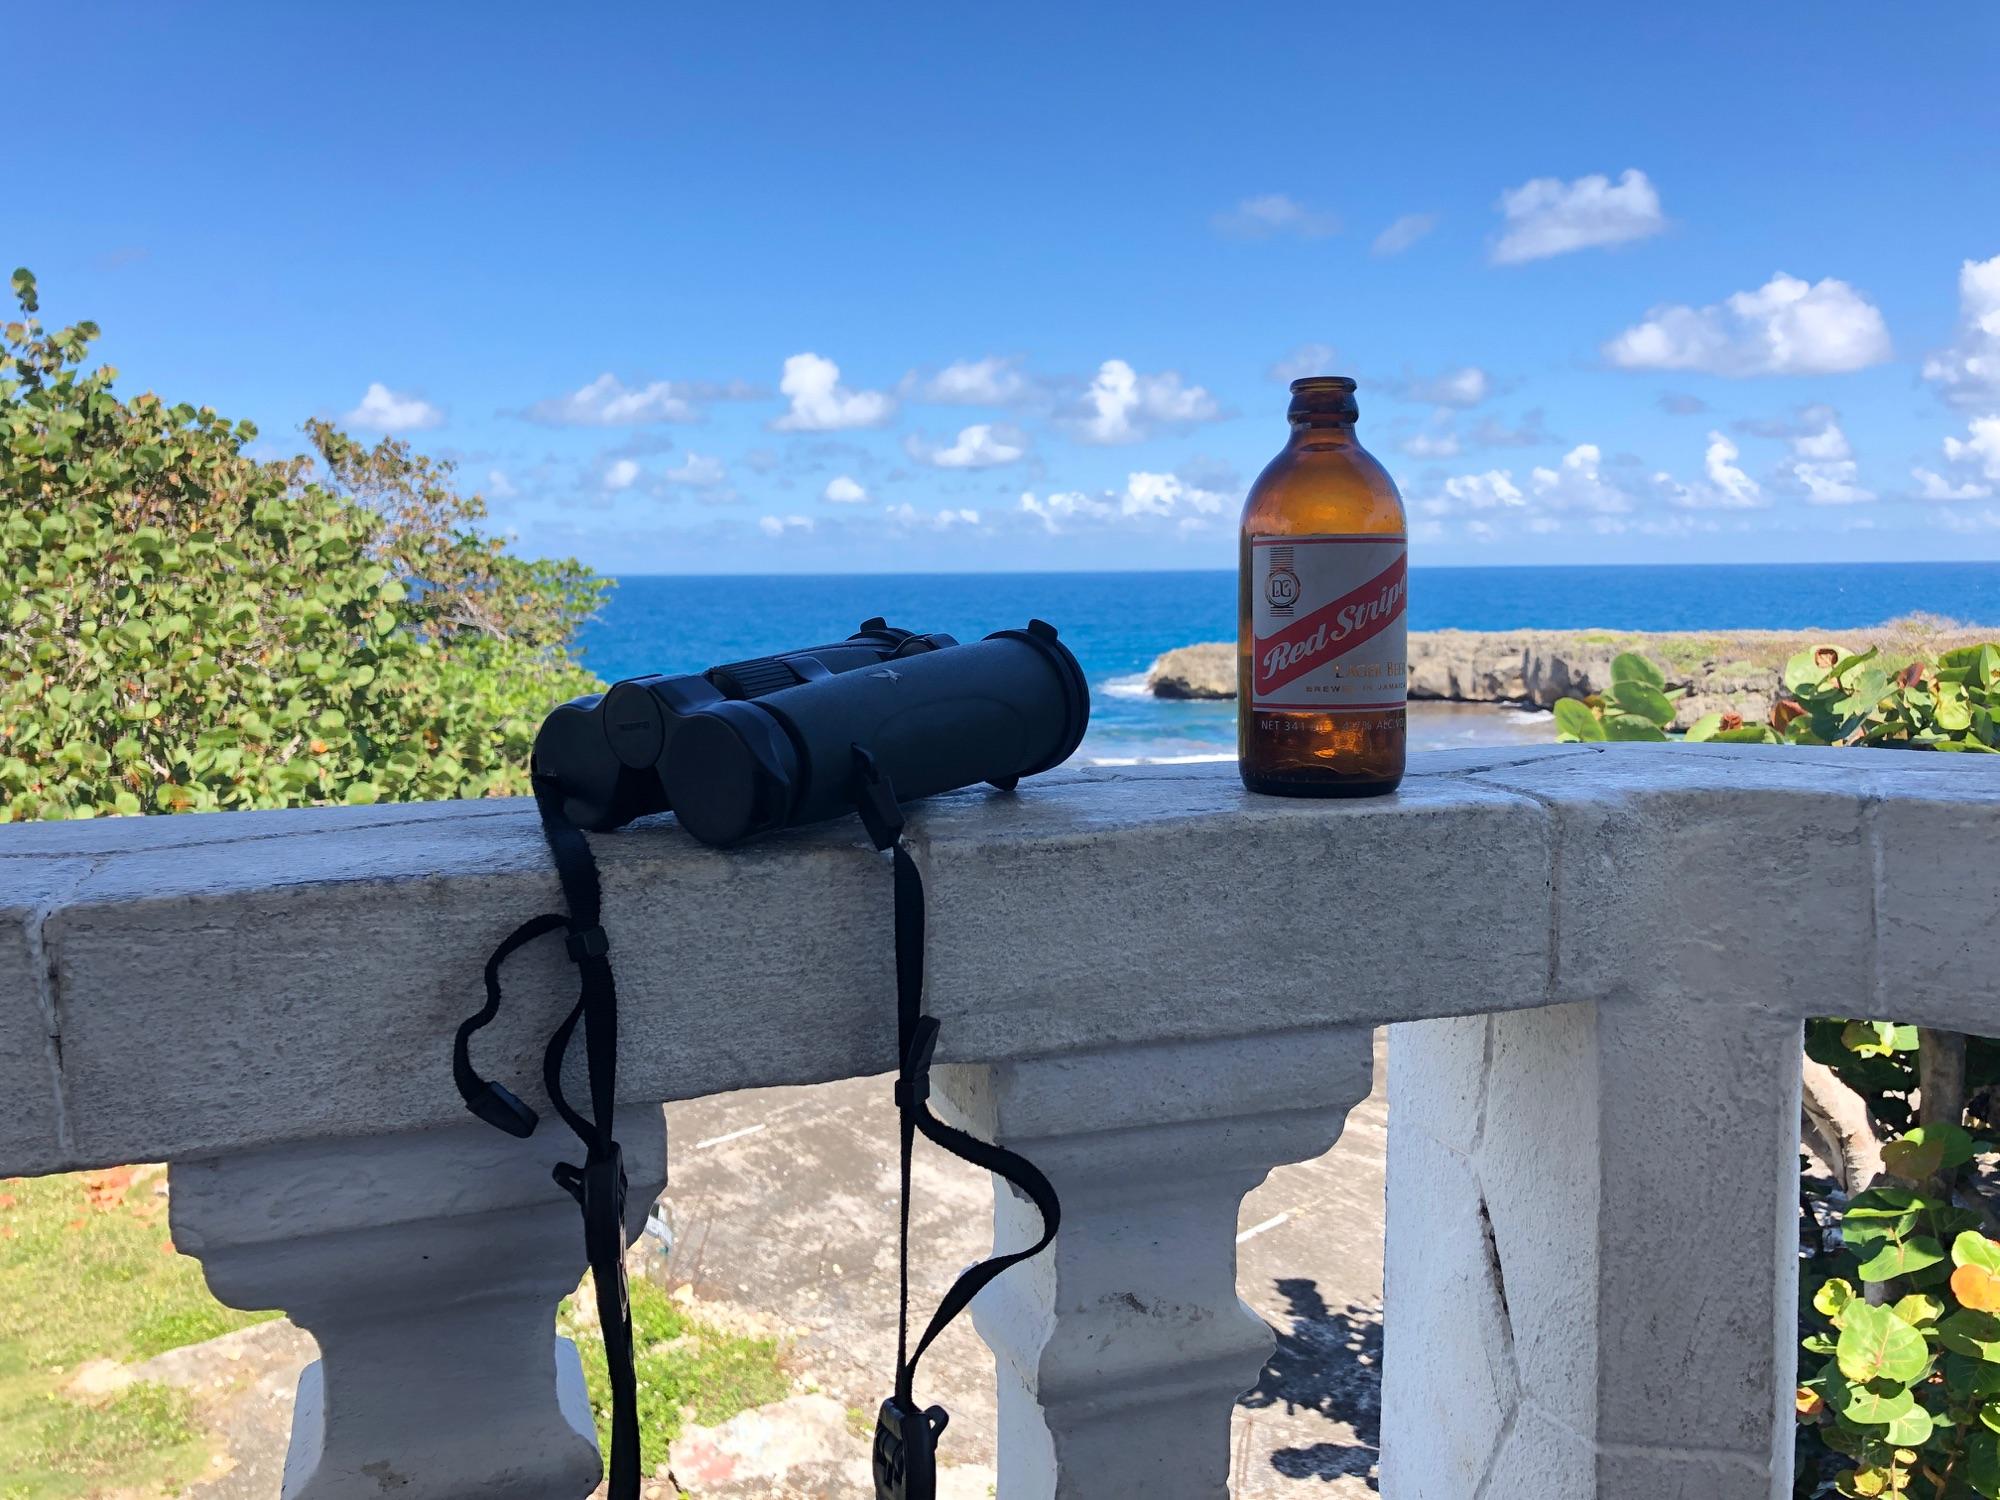 jamaican birding